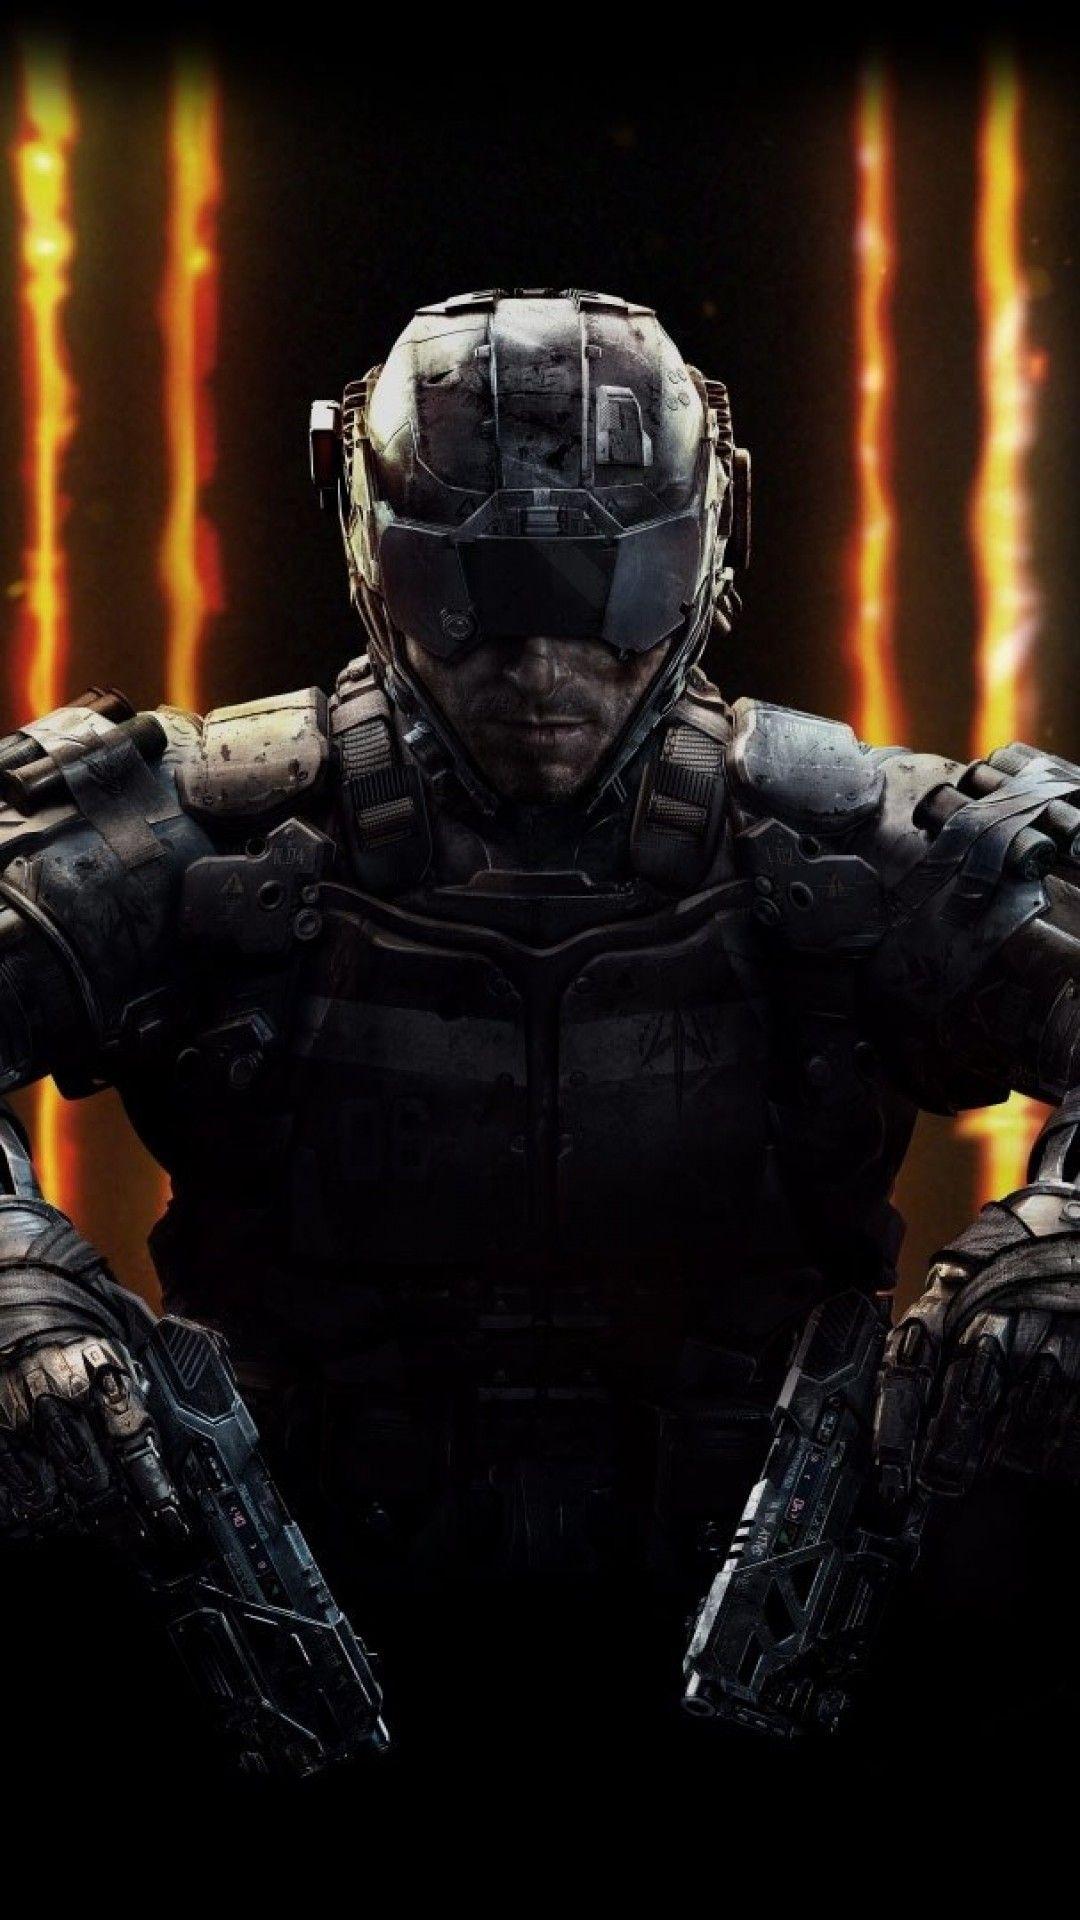 Spectre Call Of Duty Black Ops 3 Wallpaper Mobile Call Of Duty Black Ops 3 Call Of Duty Call Of Duty Black